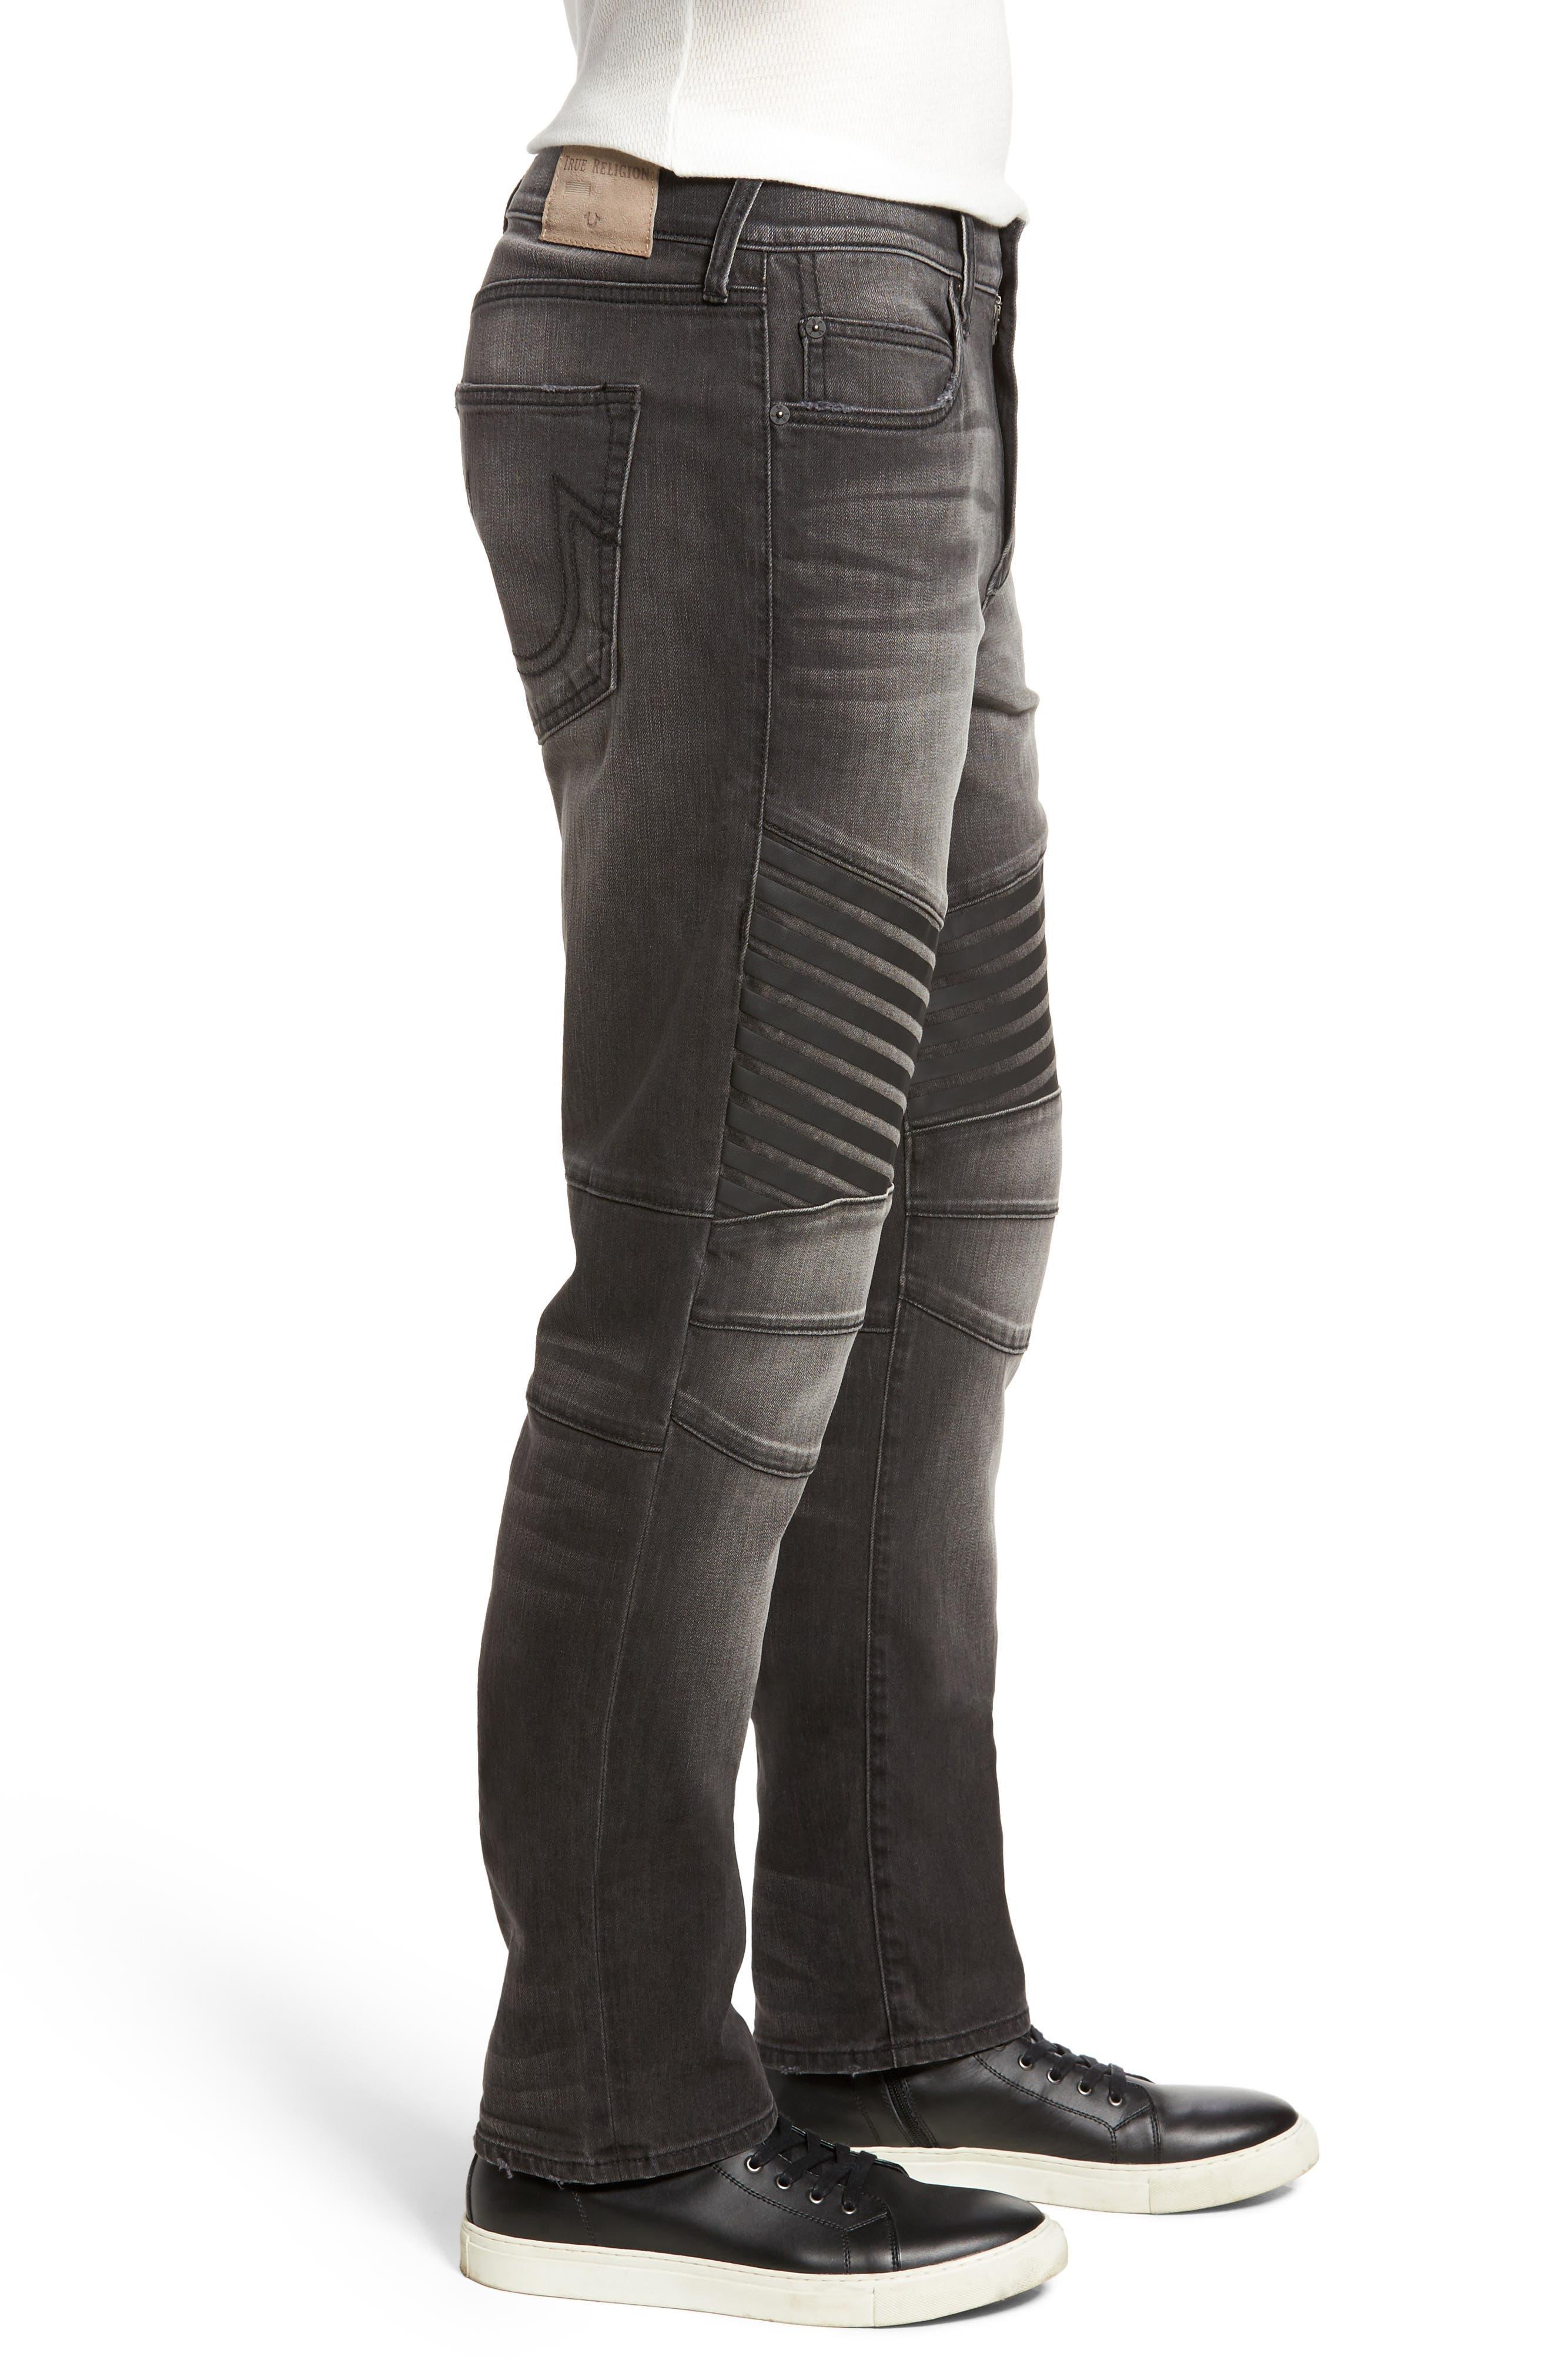 Geno Straight Leg Jeans,                             Alternate thumbnail 3, color,                             DARK REBEL RACE